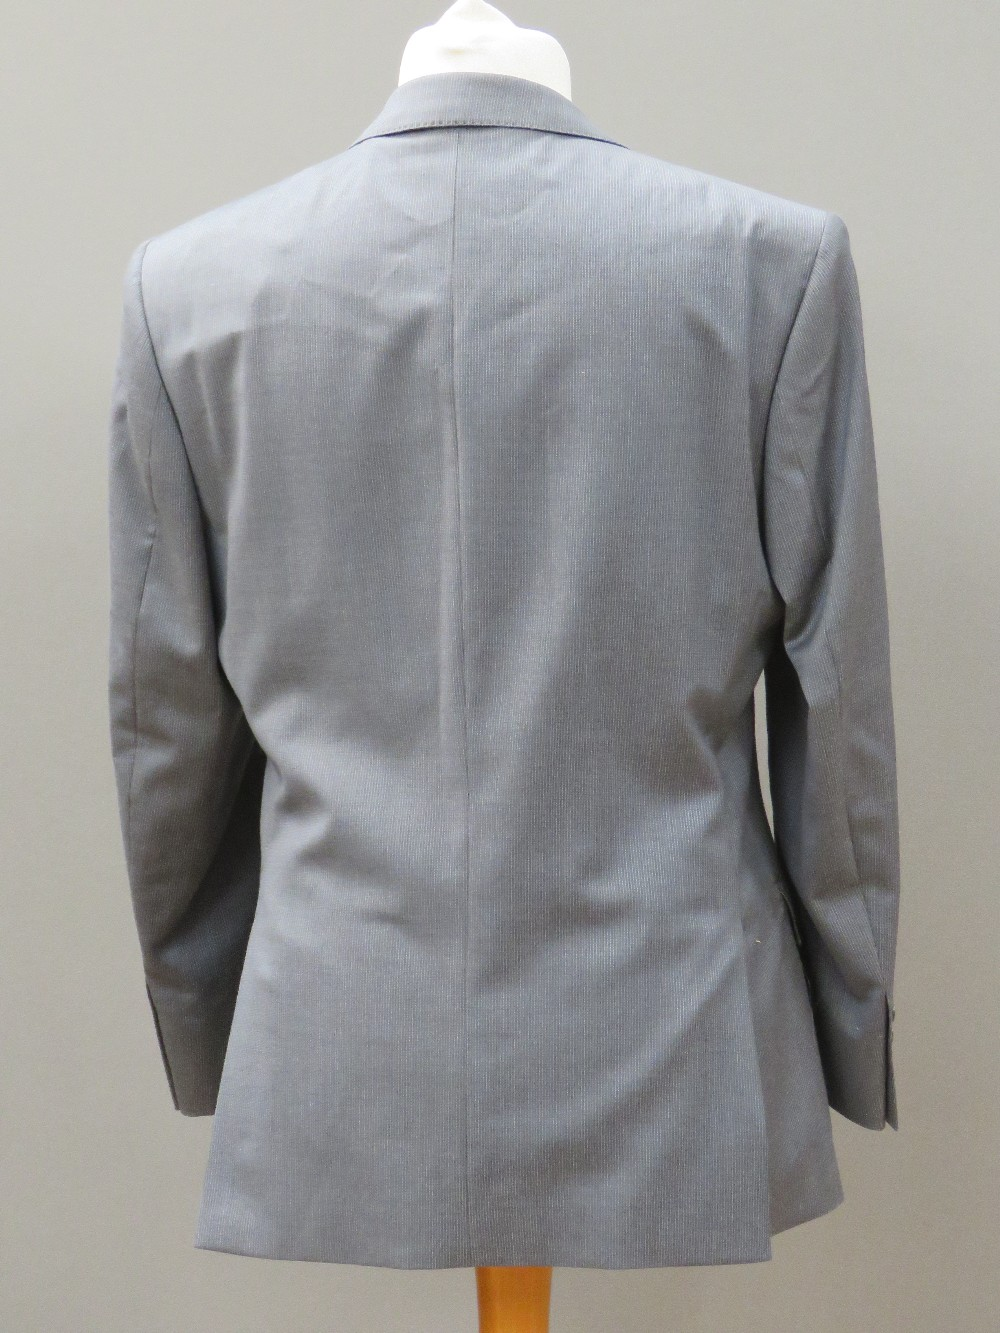 "Ben Sherman men's suit jacket, 42"" Short - Image 2 of 4"